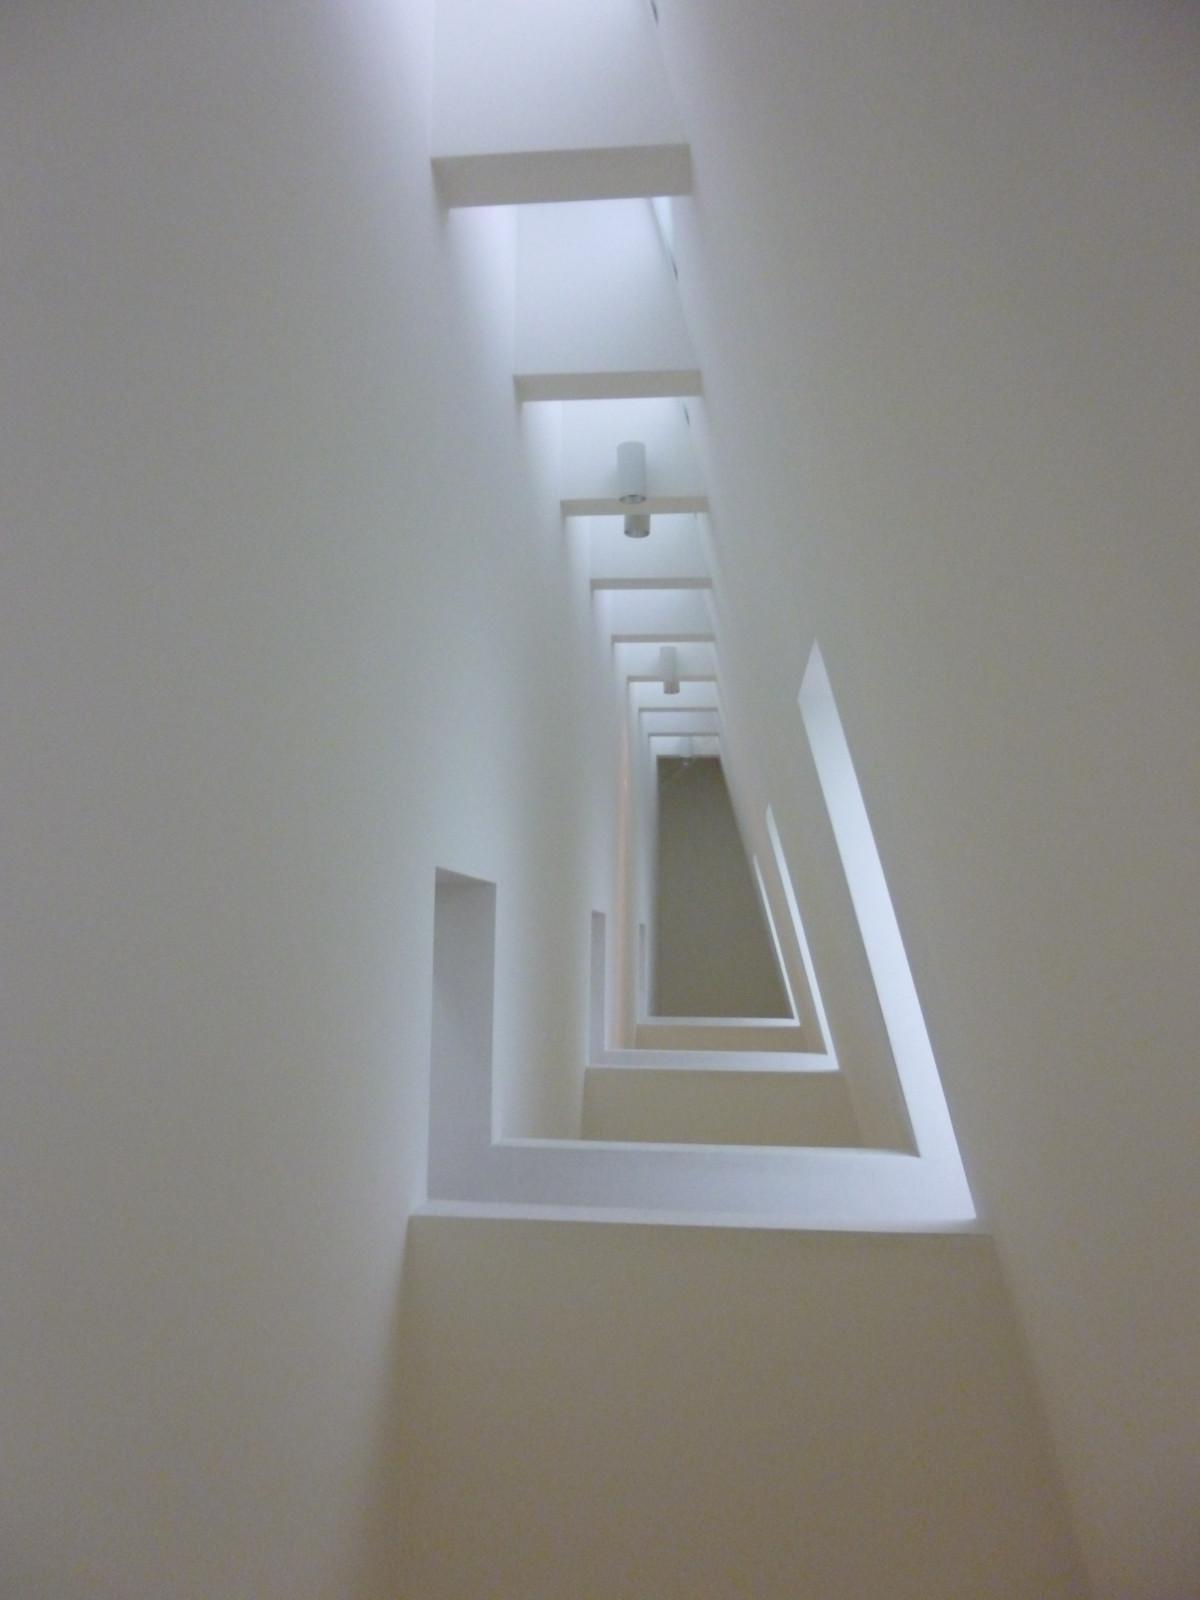 Fotos gratis ligero blanco casa piso perspectiva for Diseno de paredes interiores casas